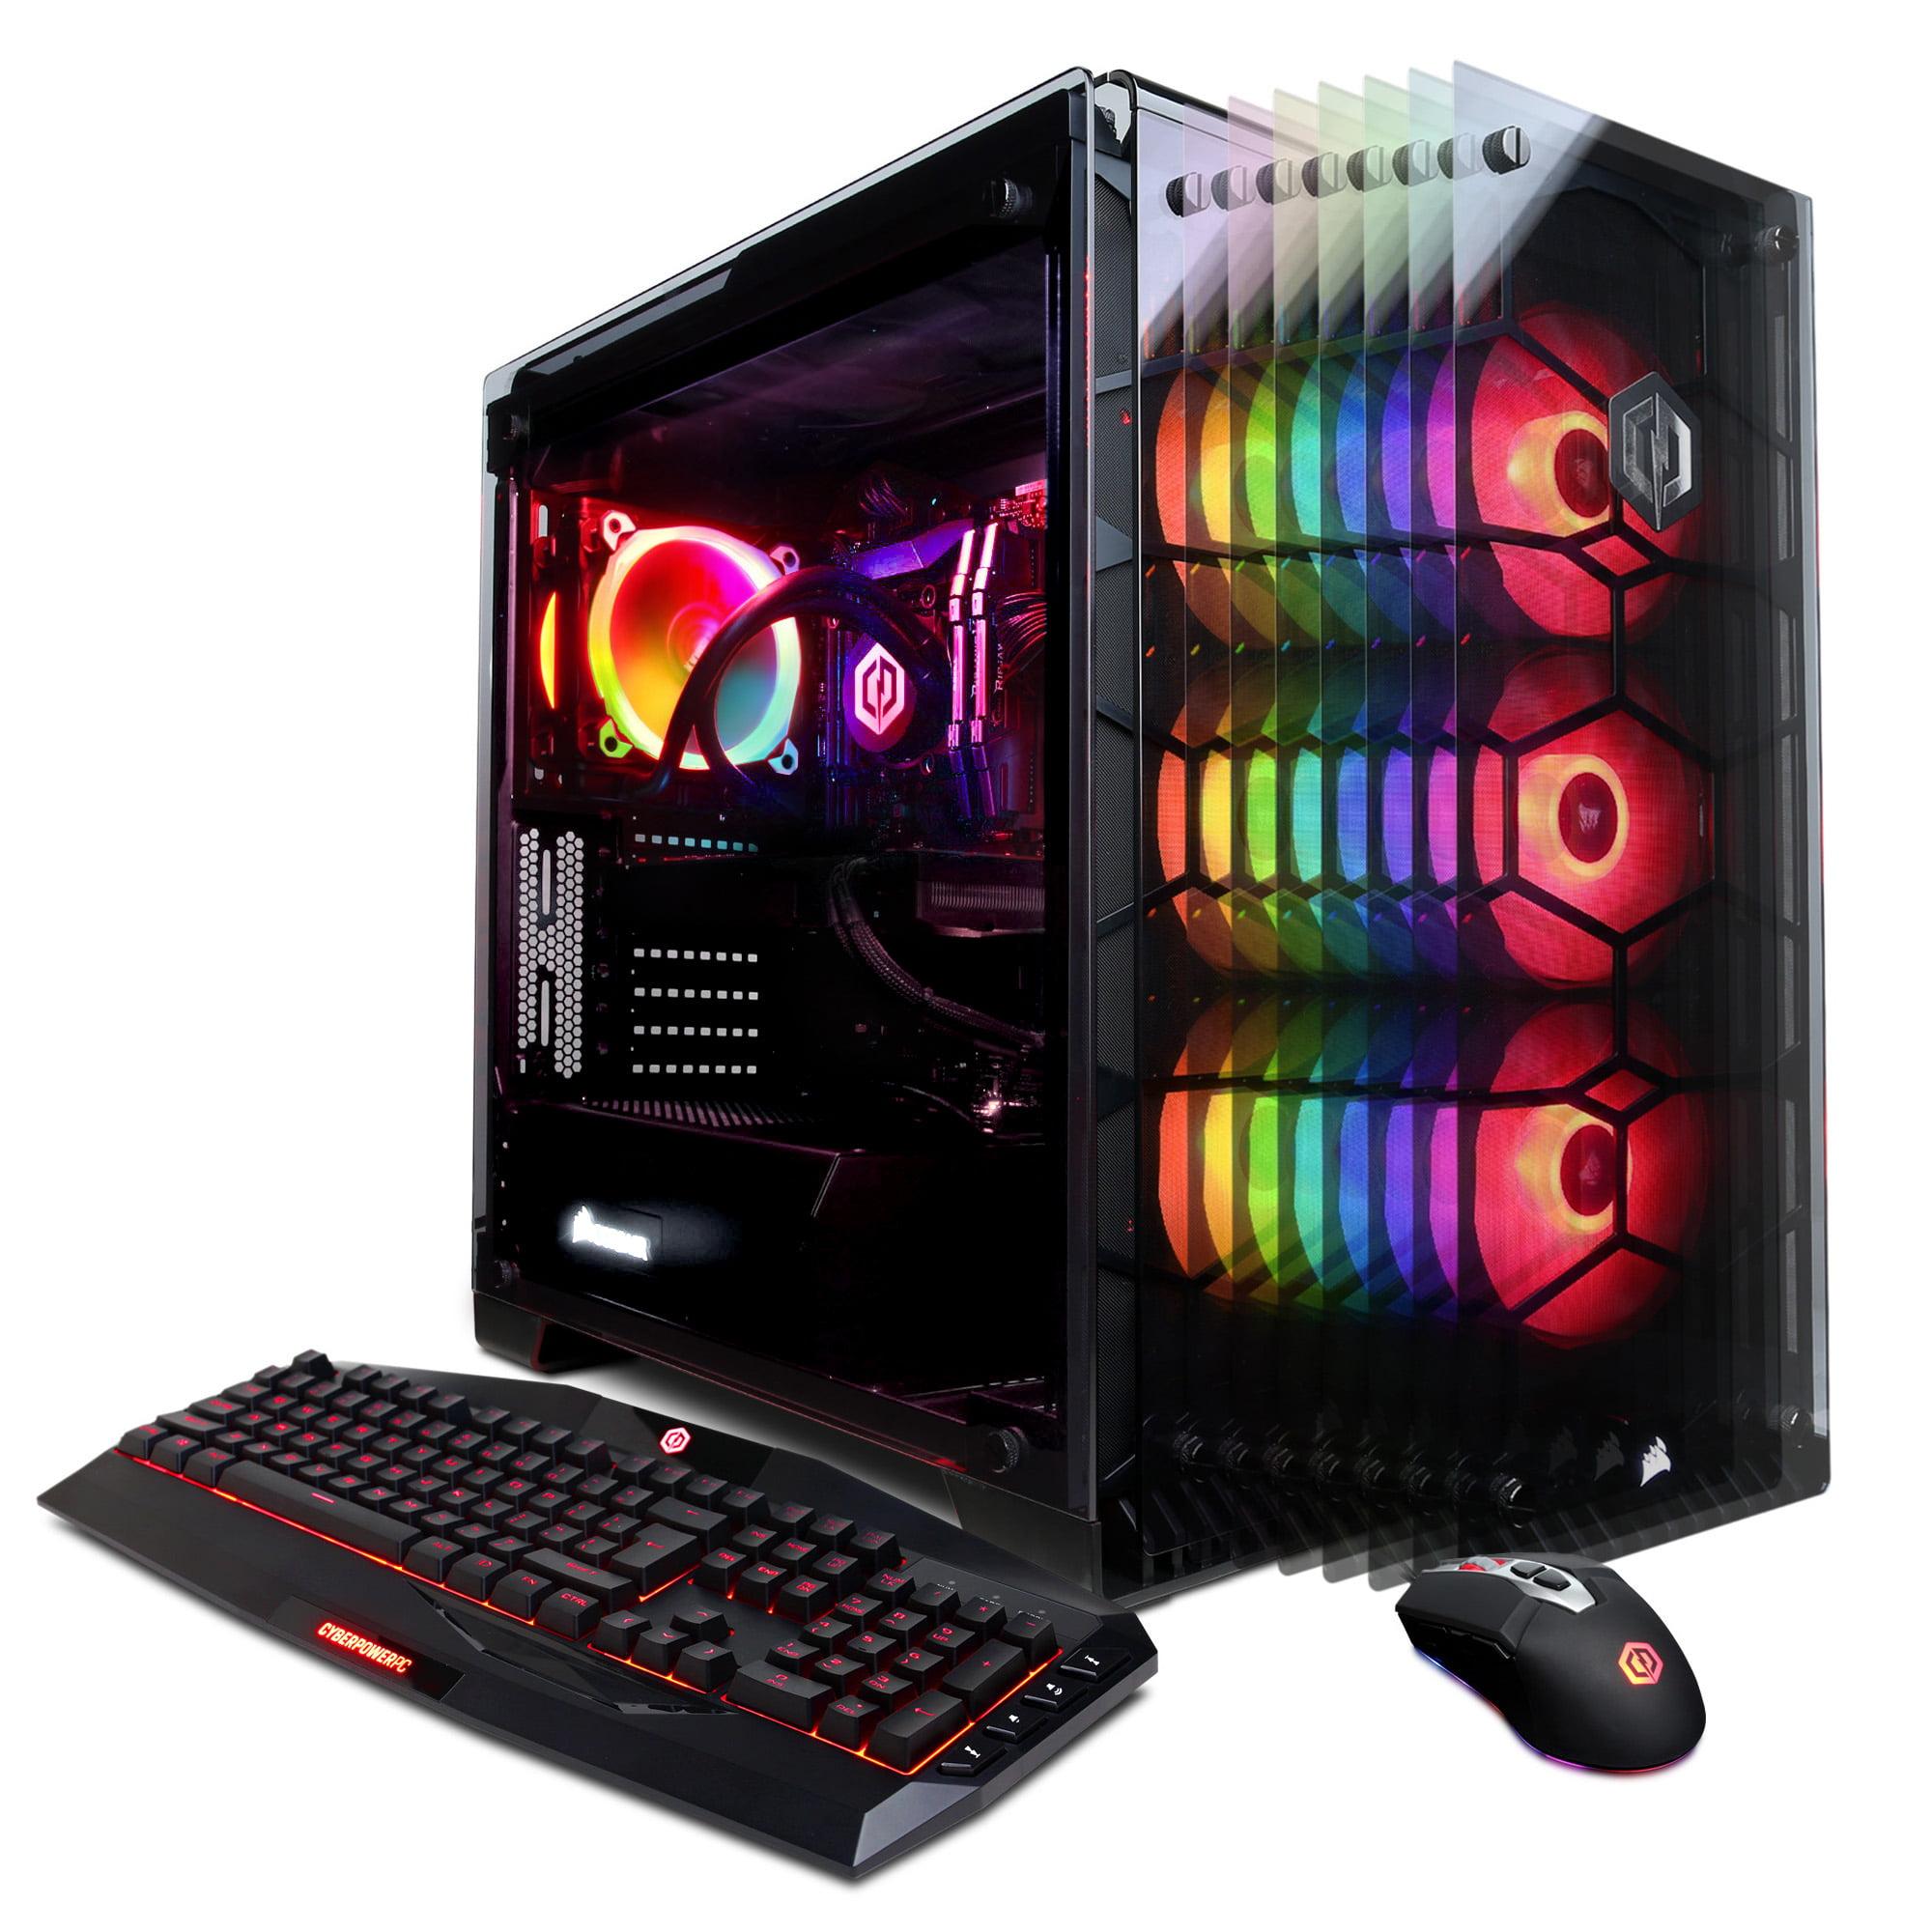 CYBERPOWERPC Gamer Supreme Liquid Cool SLC9040CPG w/ Intel i9-7960X 2.8GHz, 16GB RAM, NVIDIA GeForce RTX 2080 8GB, 480GB SSD, 2TB HDD, Windows 10 Home 64-Bit Gaming PC (no monitor)